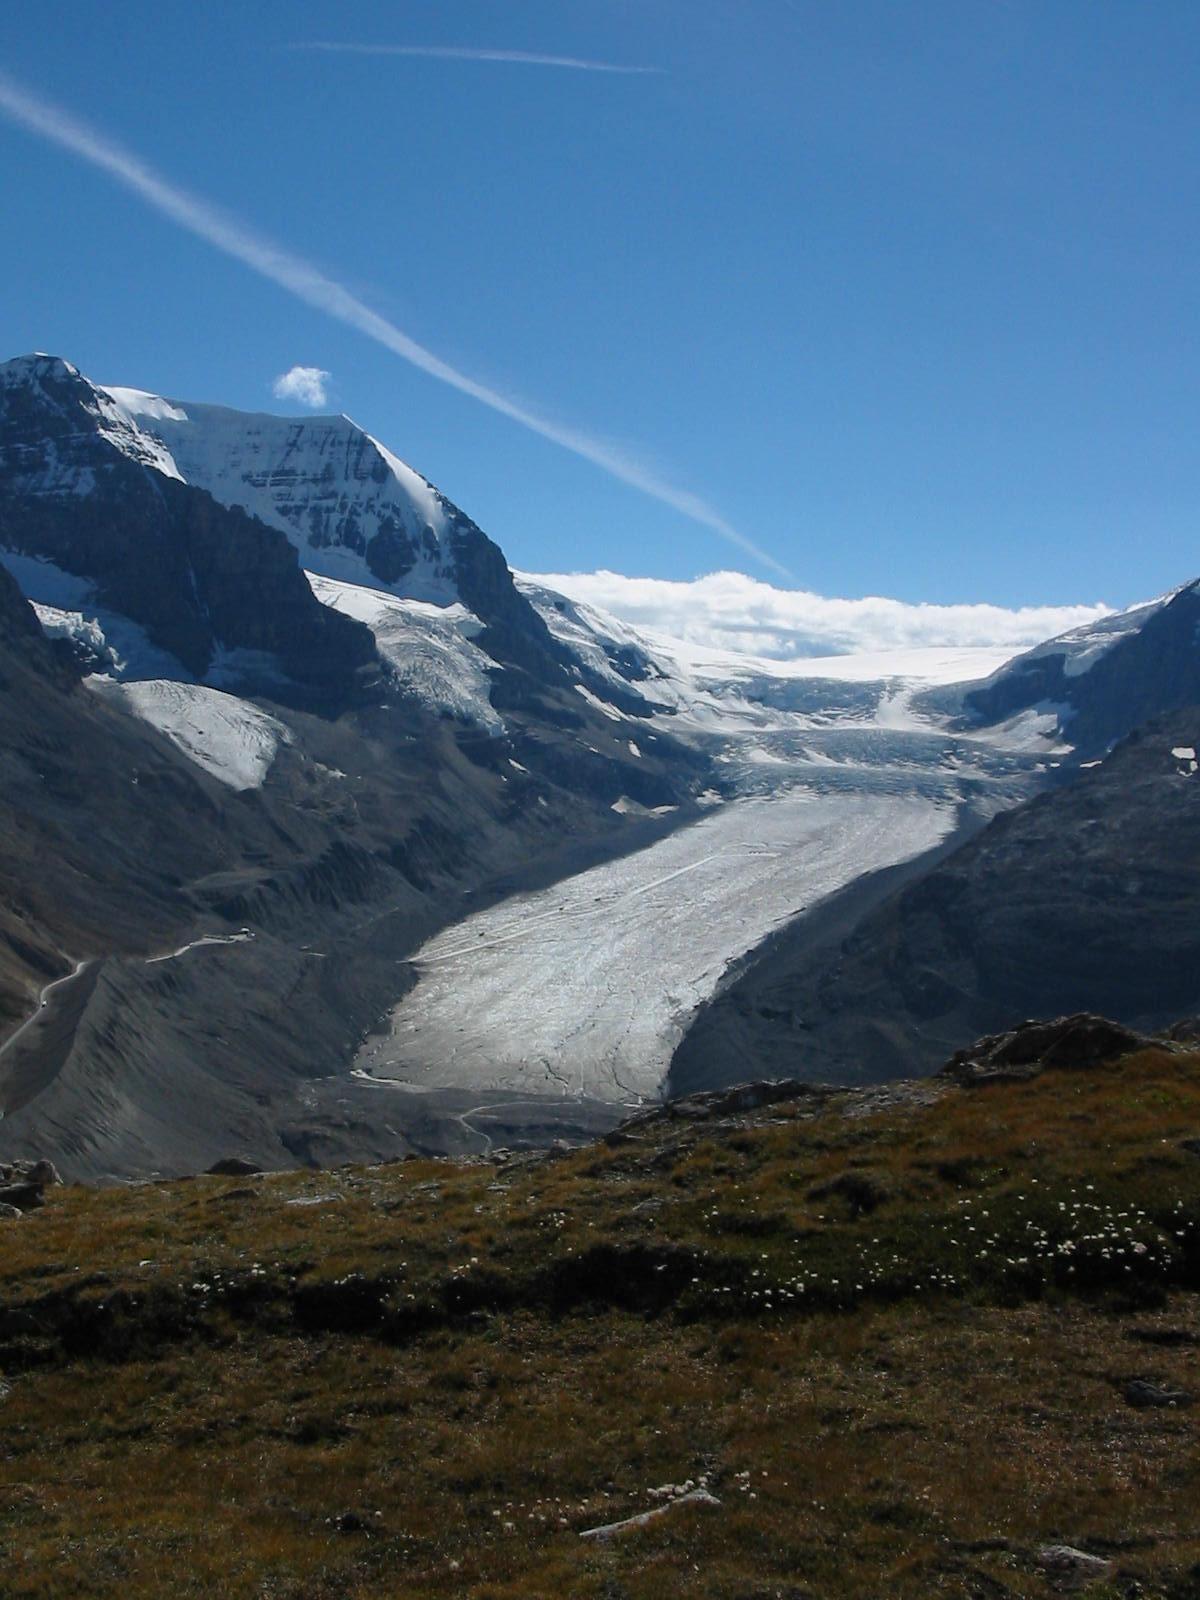 Click image for larger version  Name:Alaska 2006_20060826_901.JPG Views:89 Size:203.5 KB ID:35877